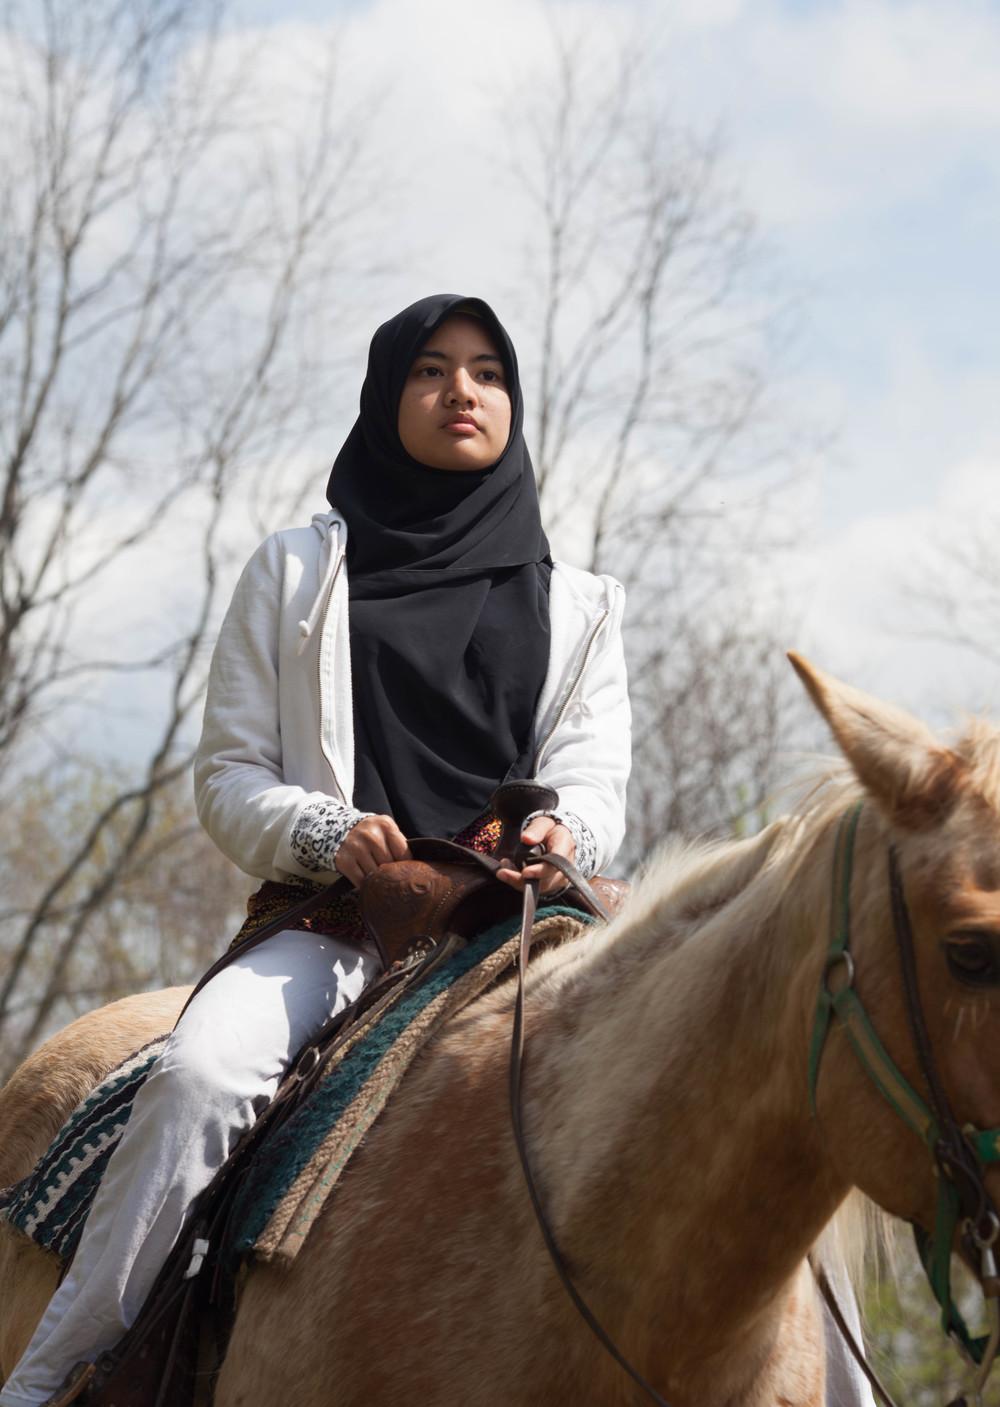 Azleen Hashim rides horseback, Rochester NY.